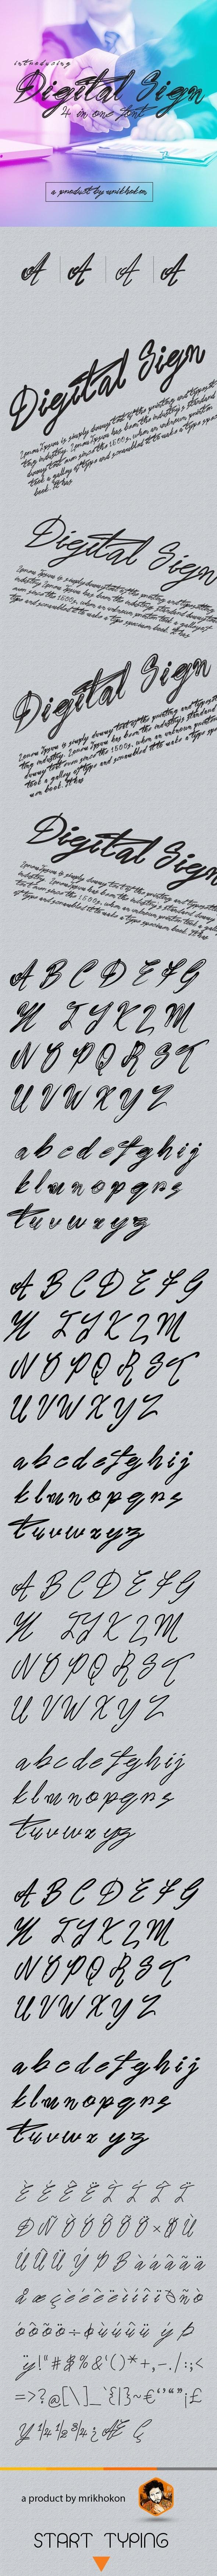 Digital Sign - Hand-writing Script